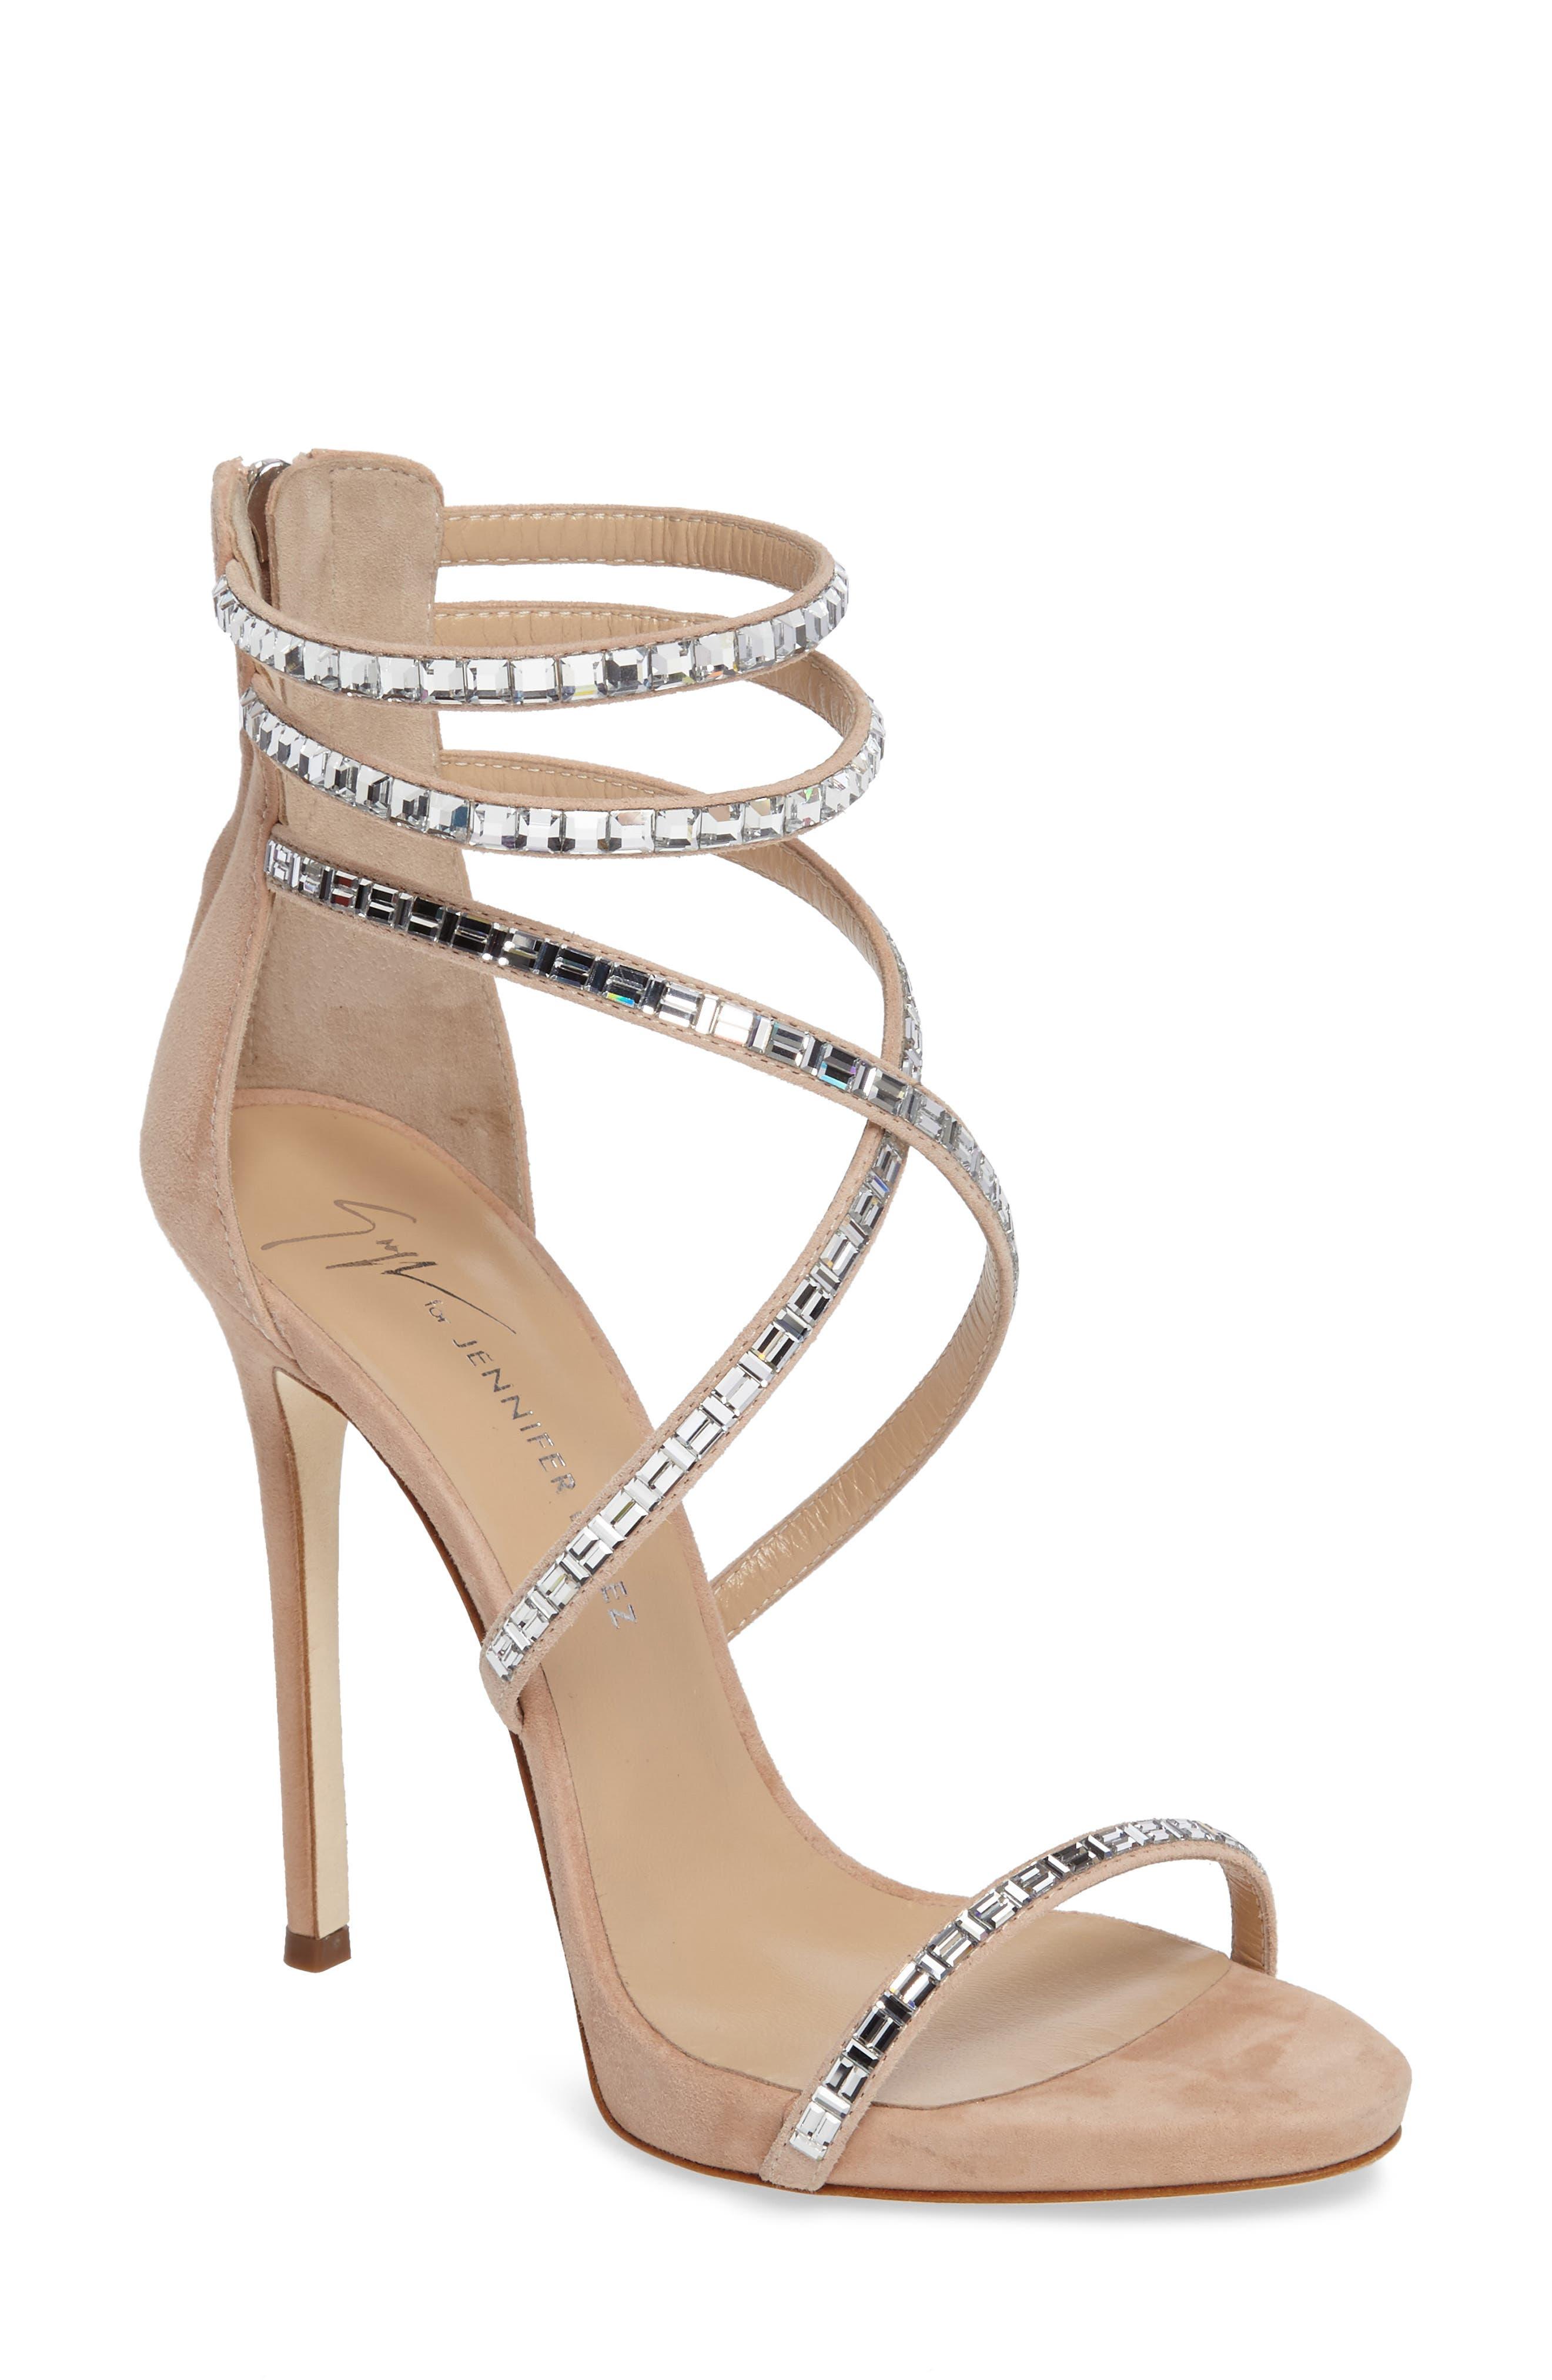 Giuseppe for Jennifer Lopez Strappy Sandal,                             Main thumbnail 2, color,